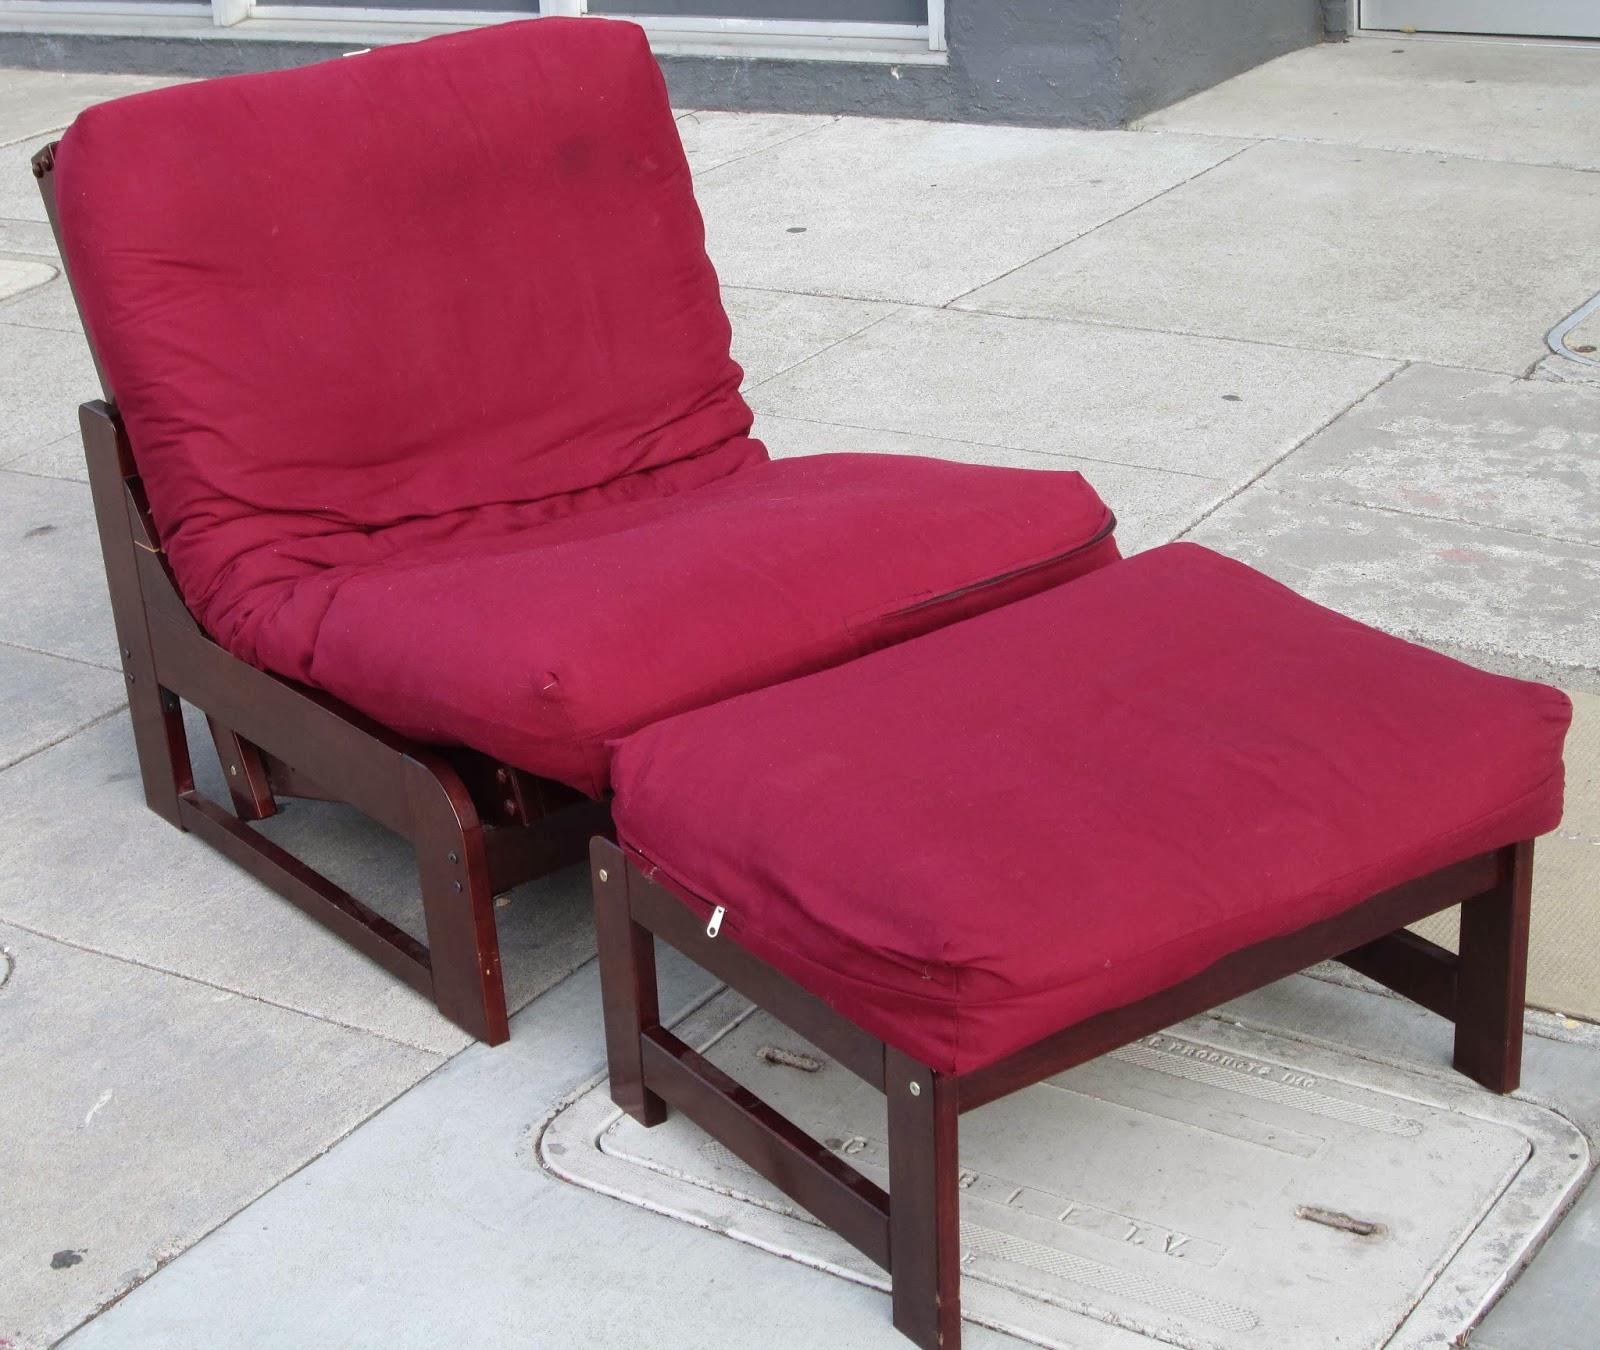 Sold Red Single Futon Chair Ottoman Cushions 70